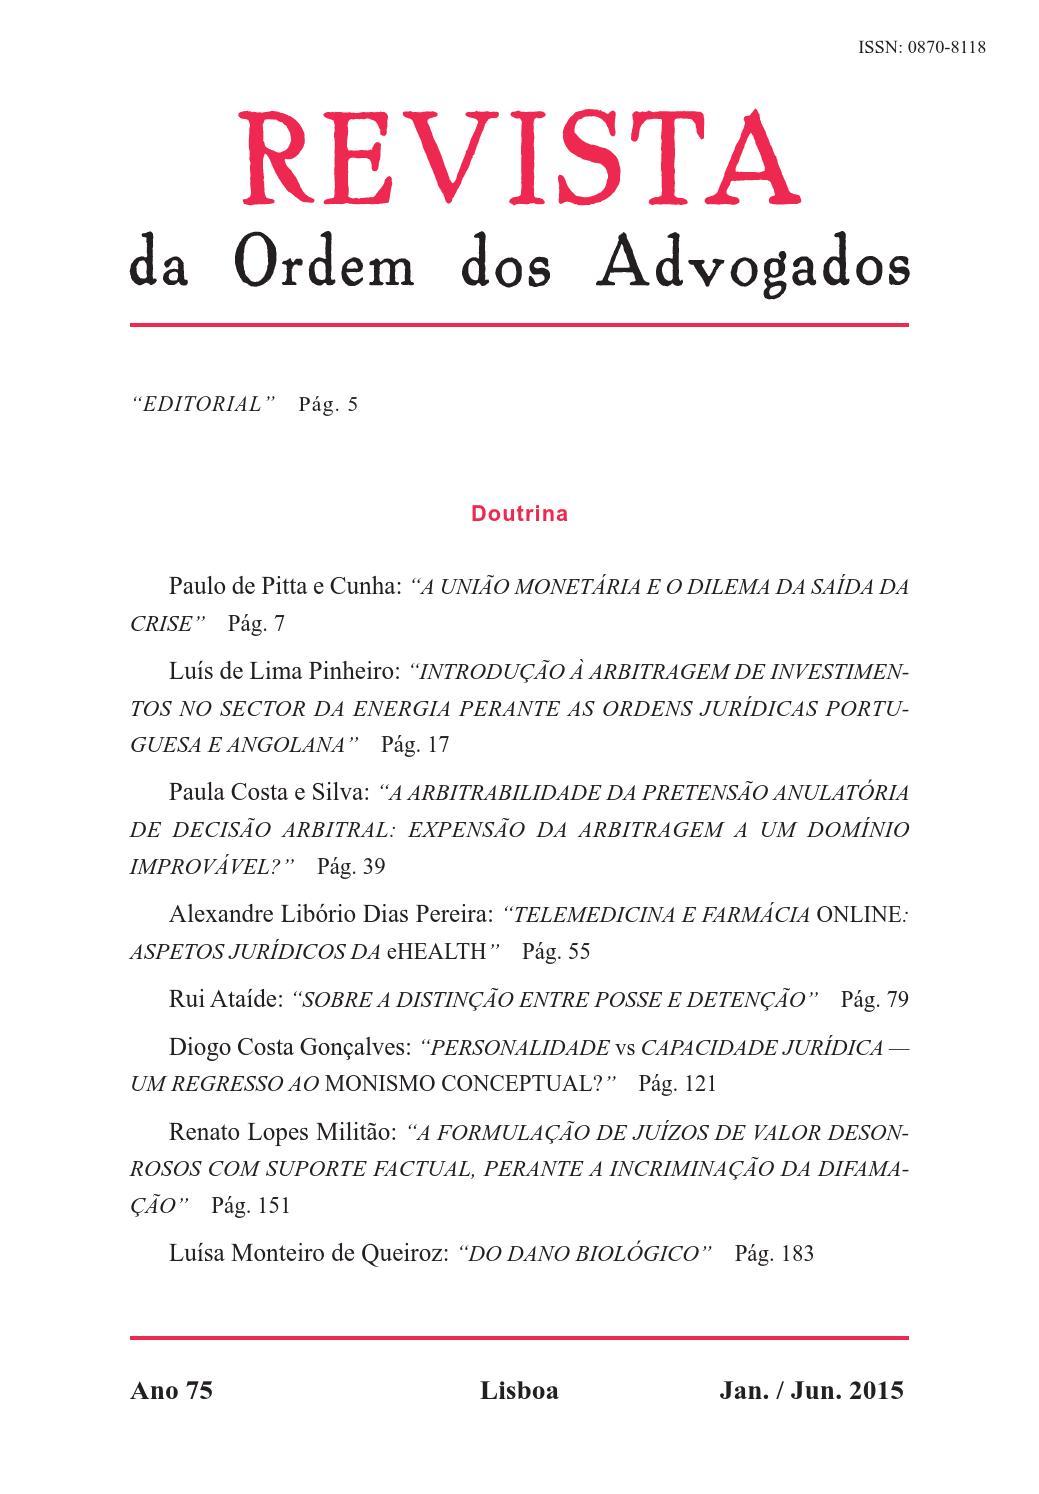 ROA Ano75 jan jun2015 doutrina by Ordem dos Advogados - issuu b885488413c